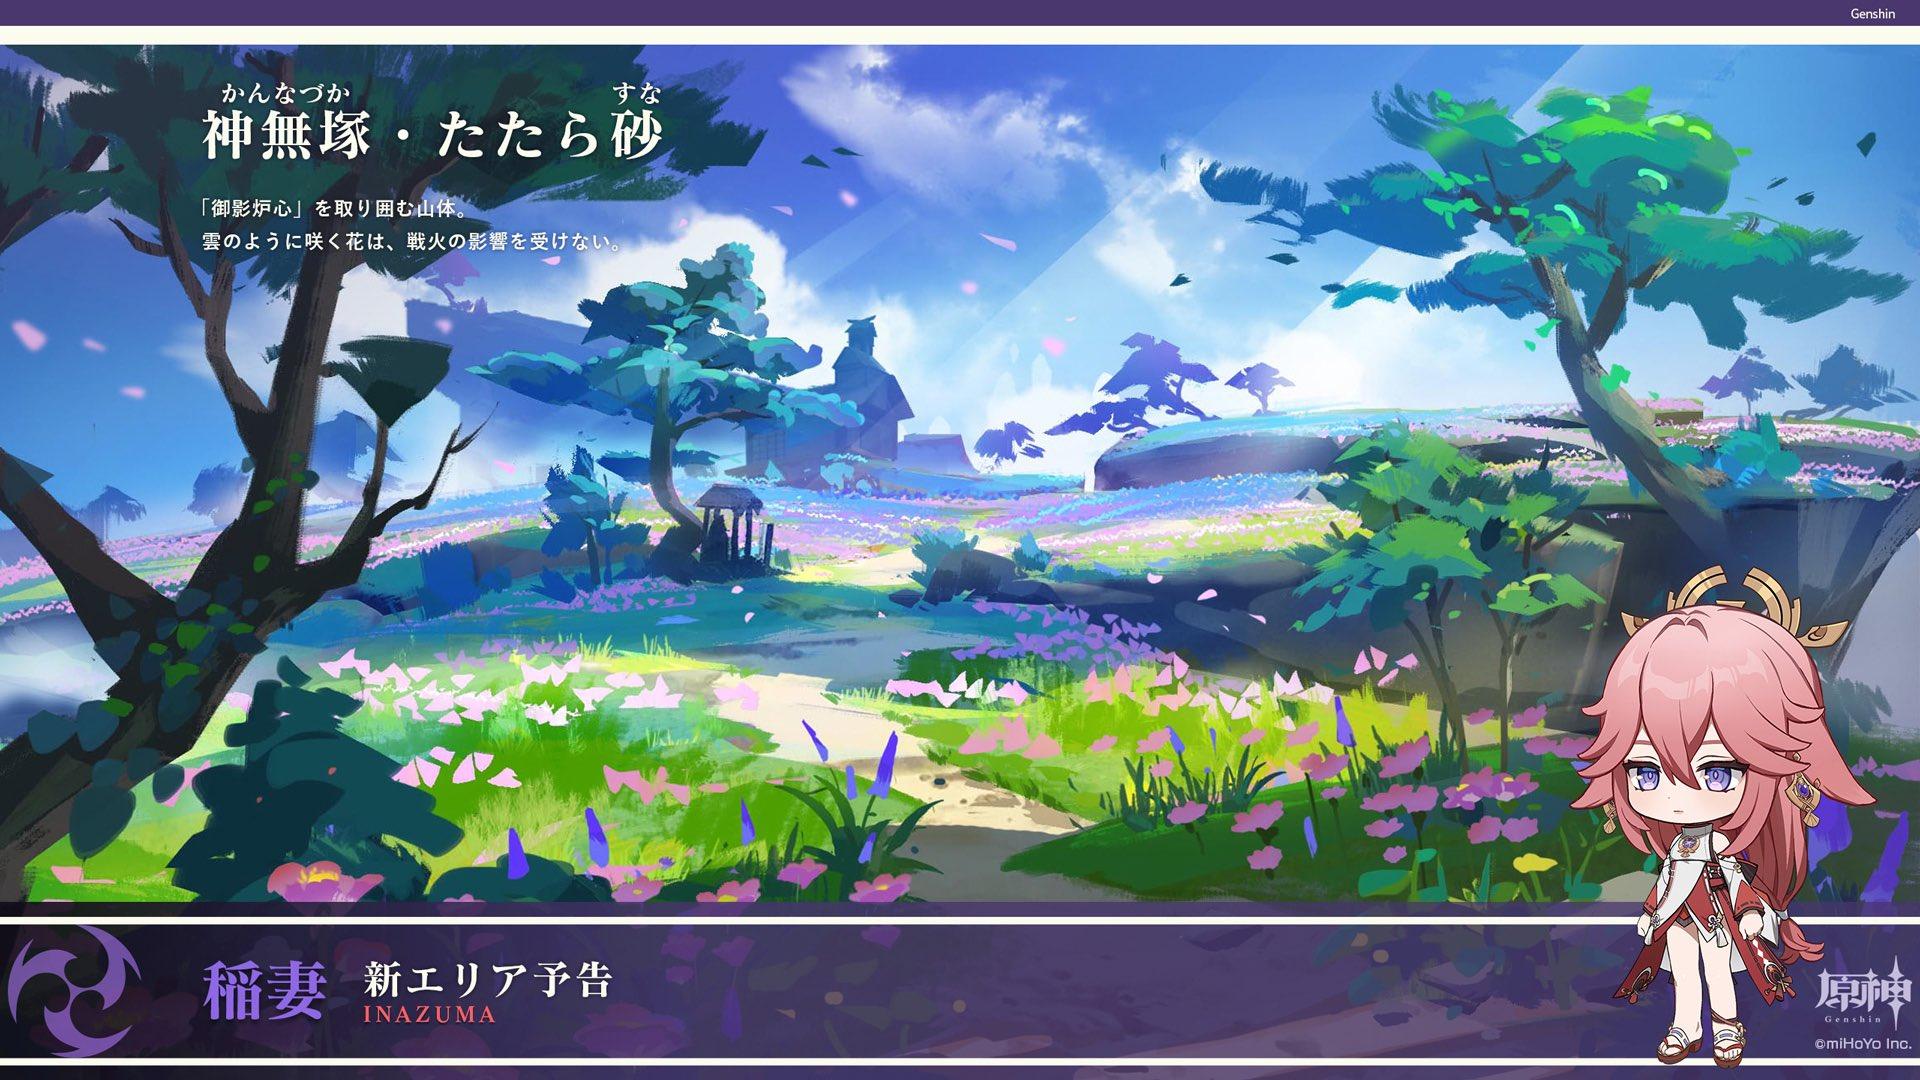 inzuma-genshin-impact-1